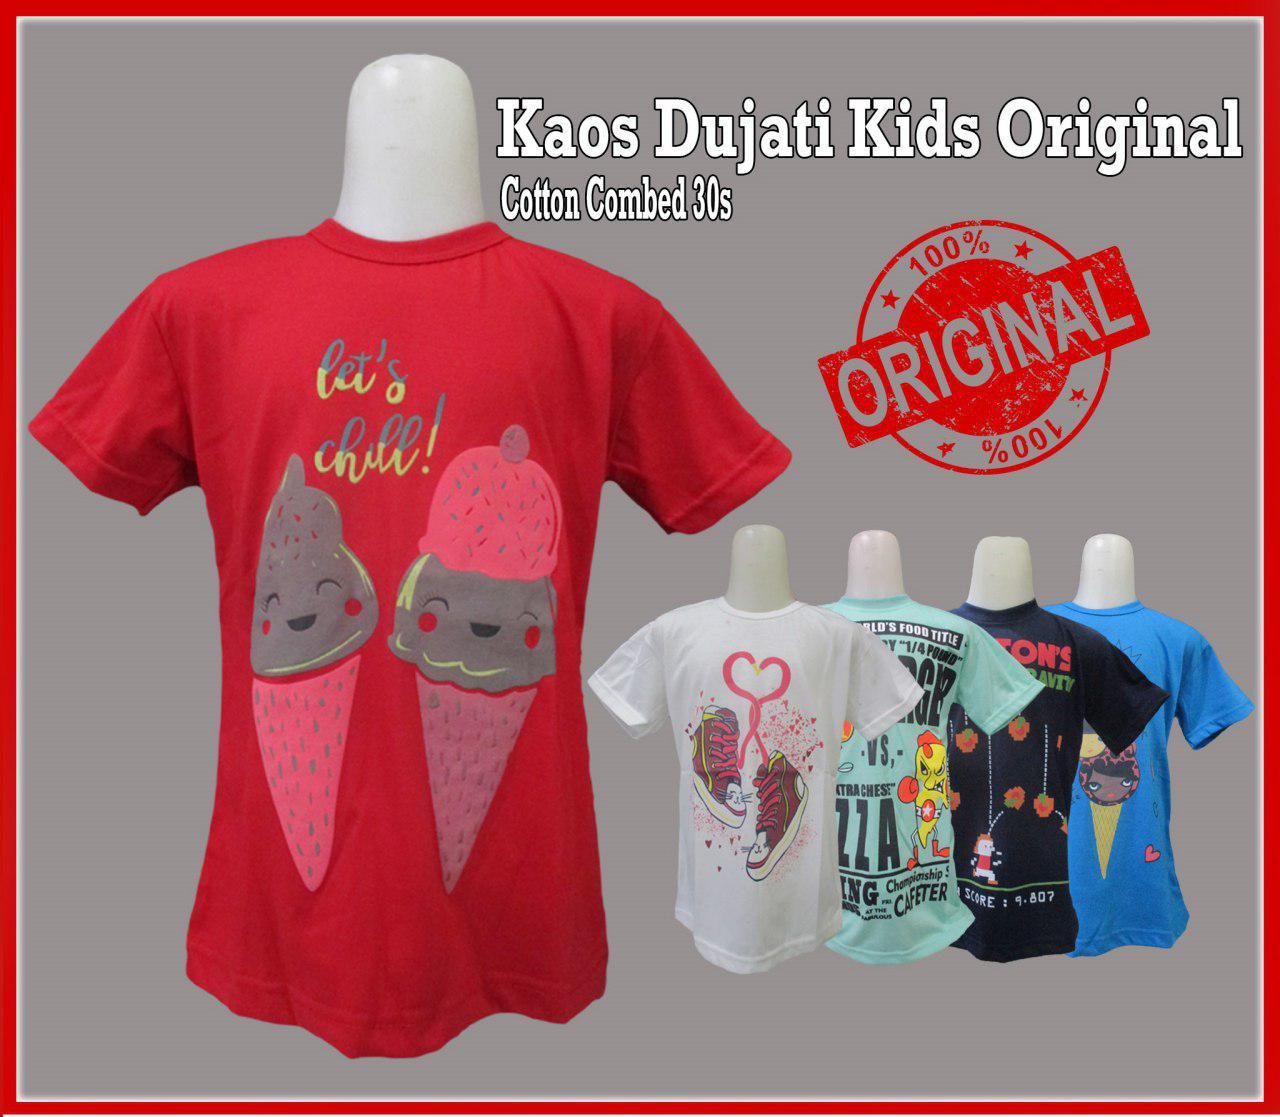 Pusat Grosir Baju Murah Solo Klewer 2019 Pusat Grosir Kaos Dujati Kids Ori Murah 20ribuan